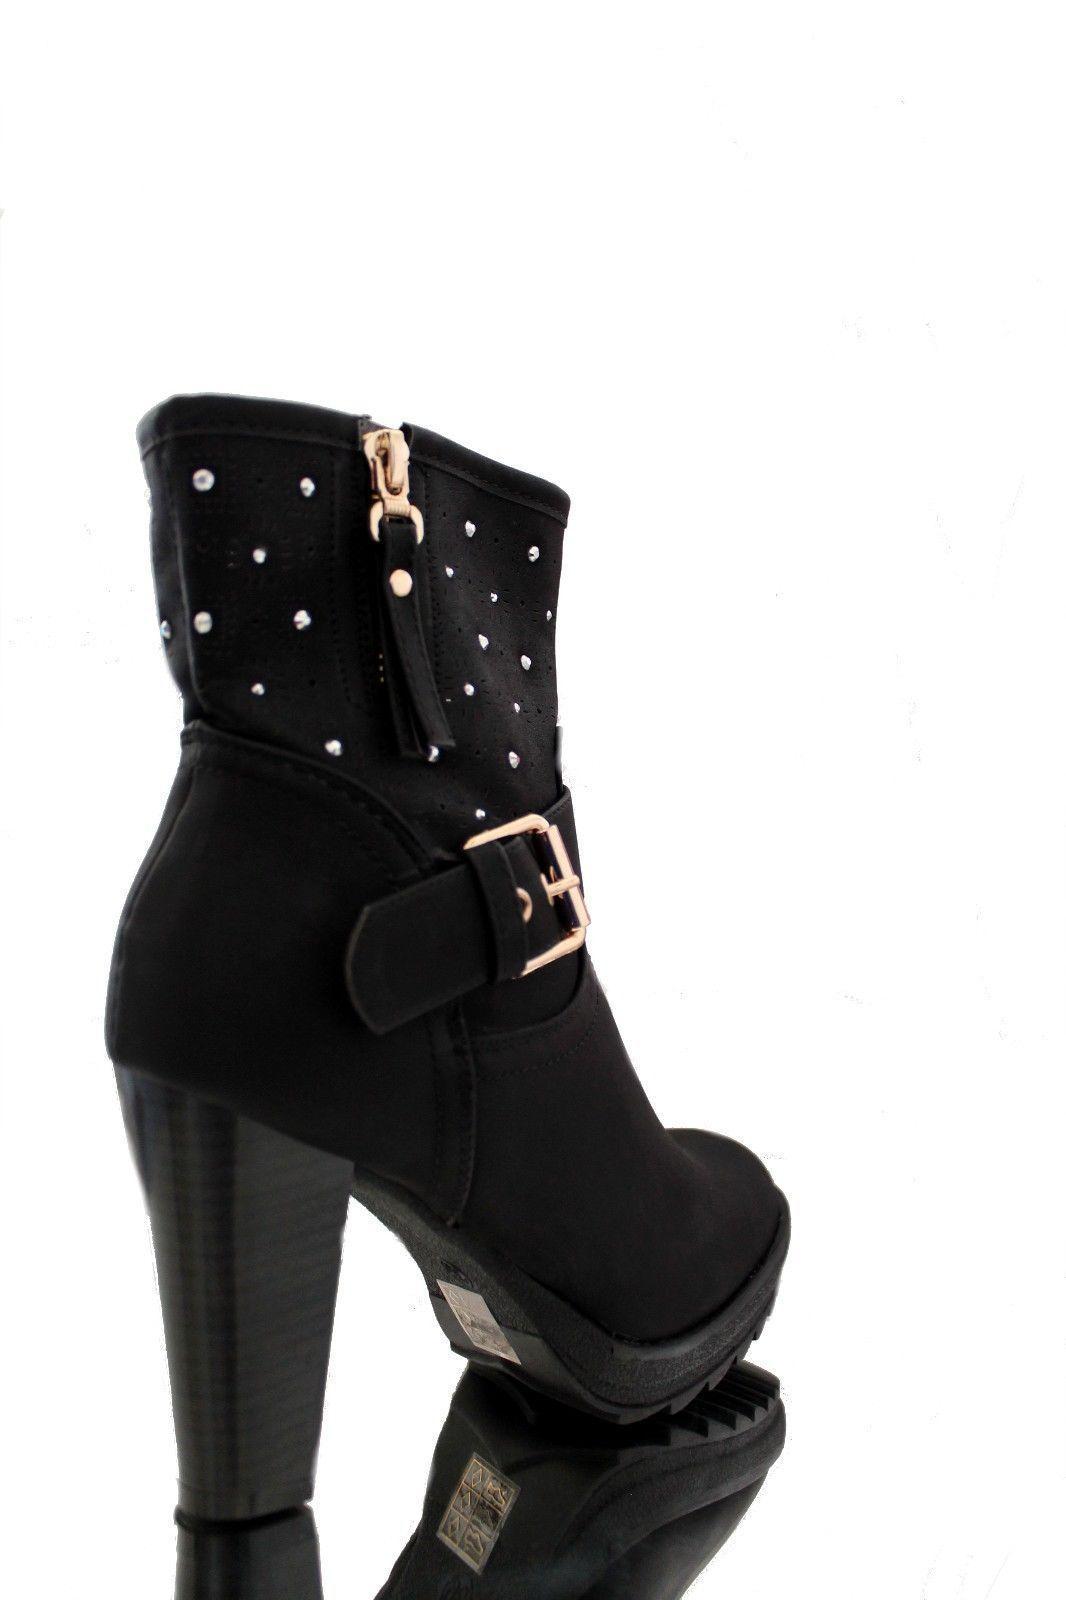 damen stiefel stiefeletten ankle boots high heels. Black Bedroom Furniture Sets. Home Design Ideas